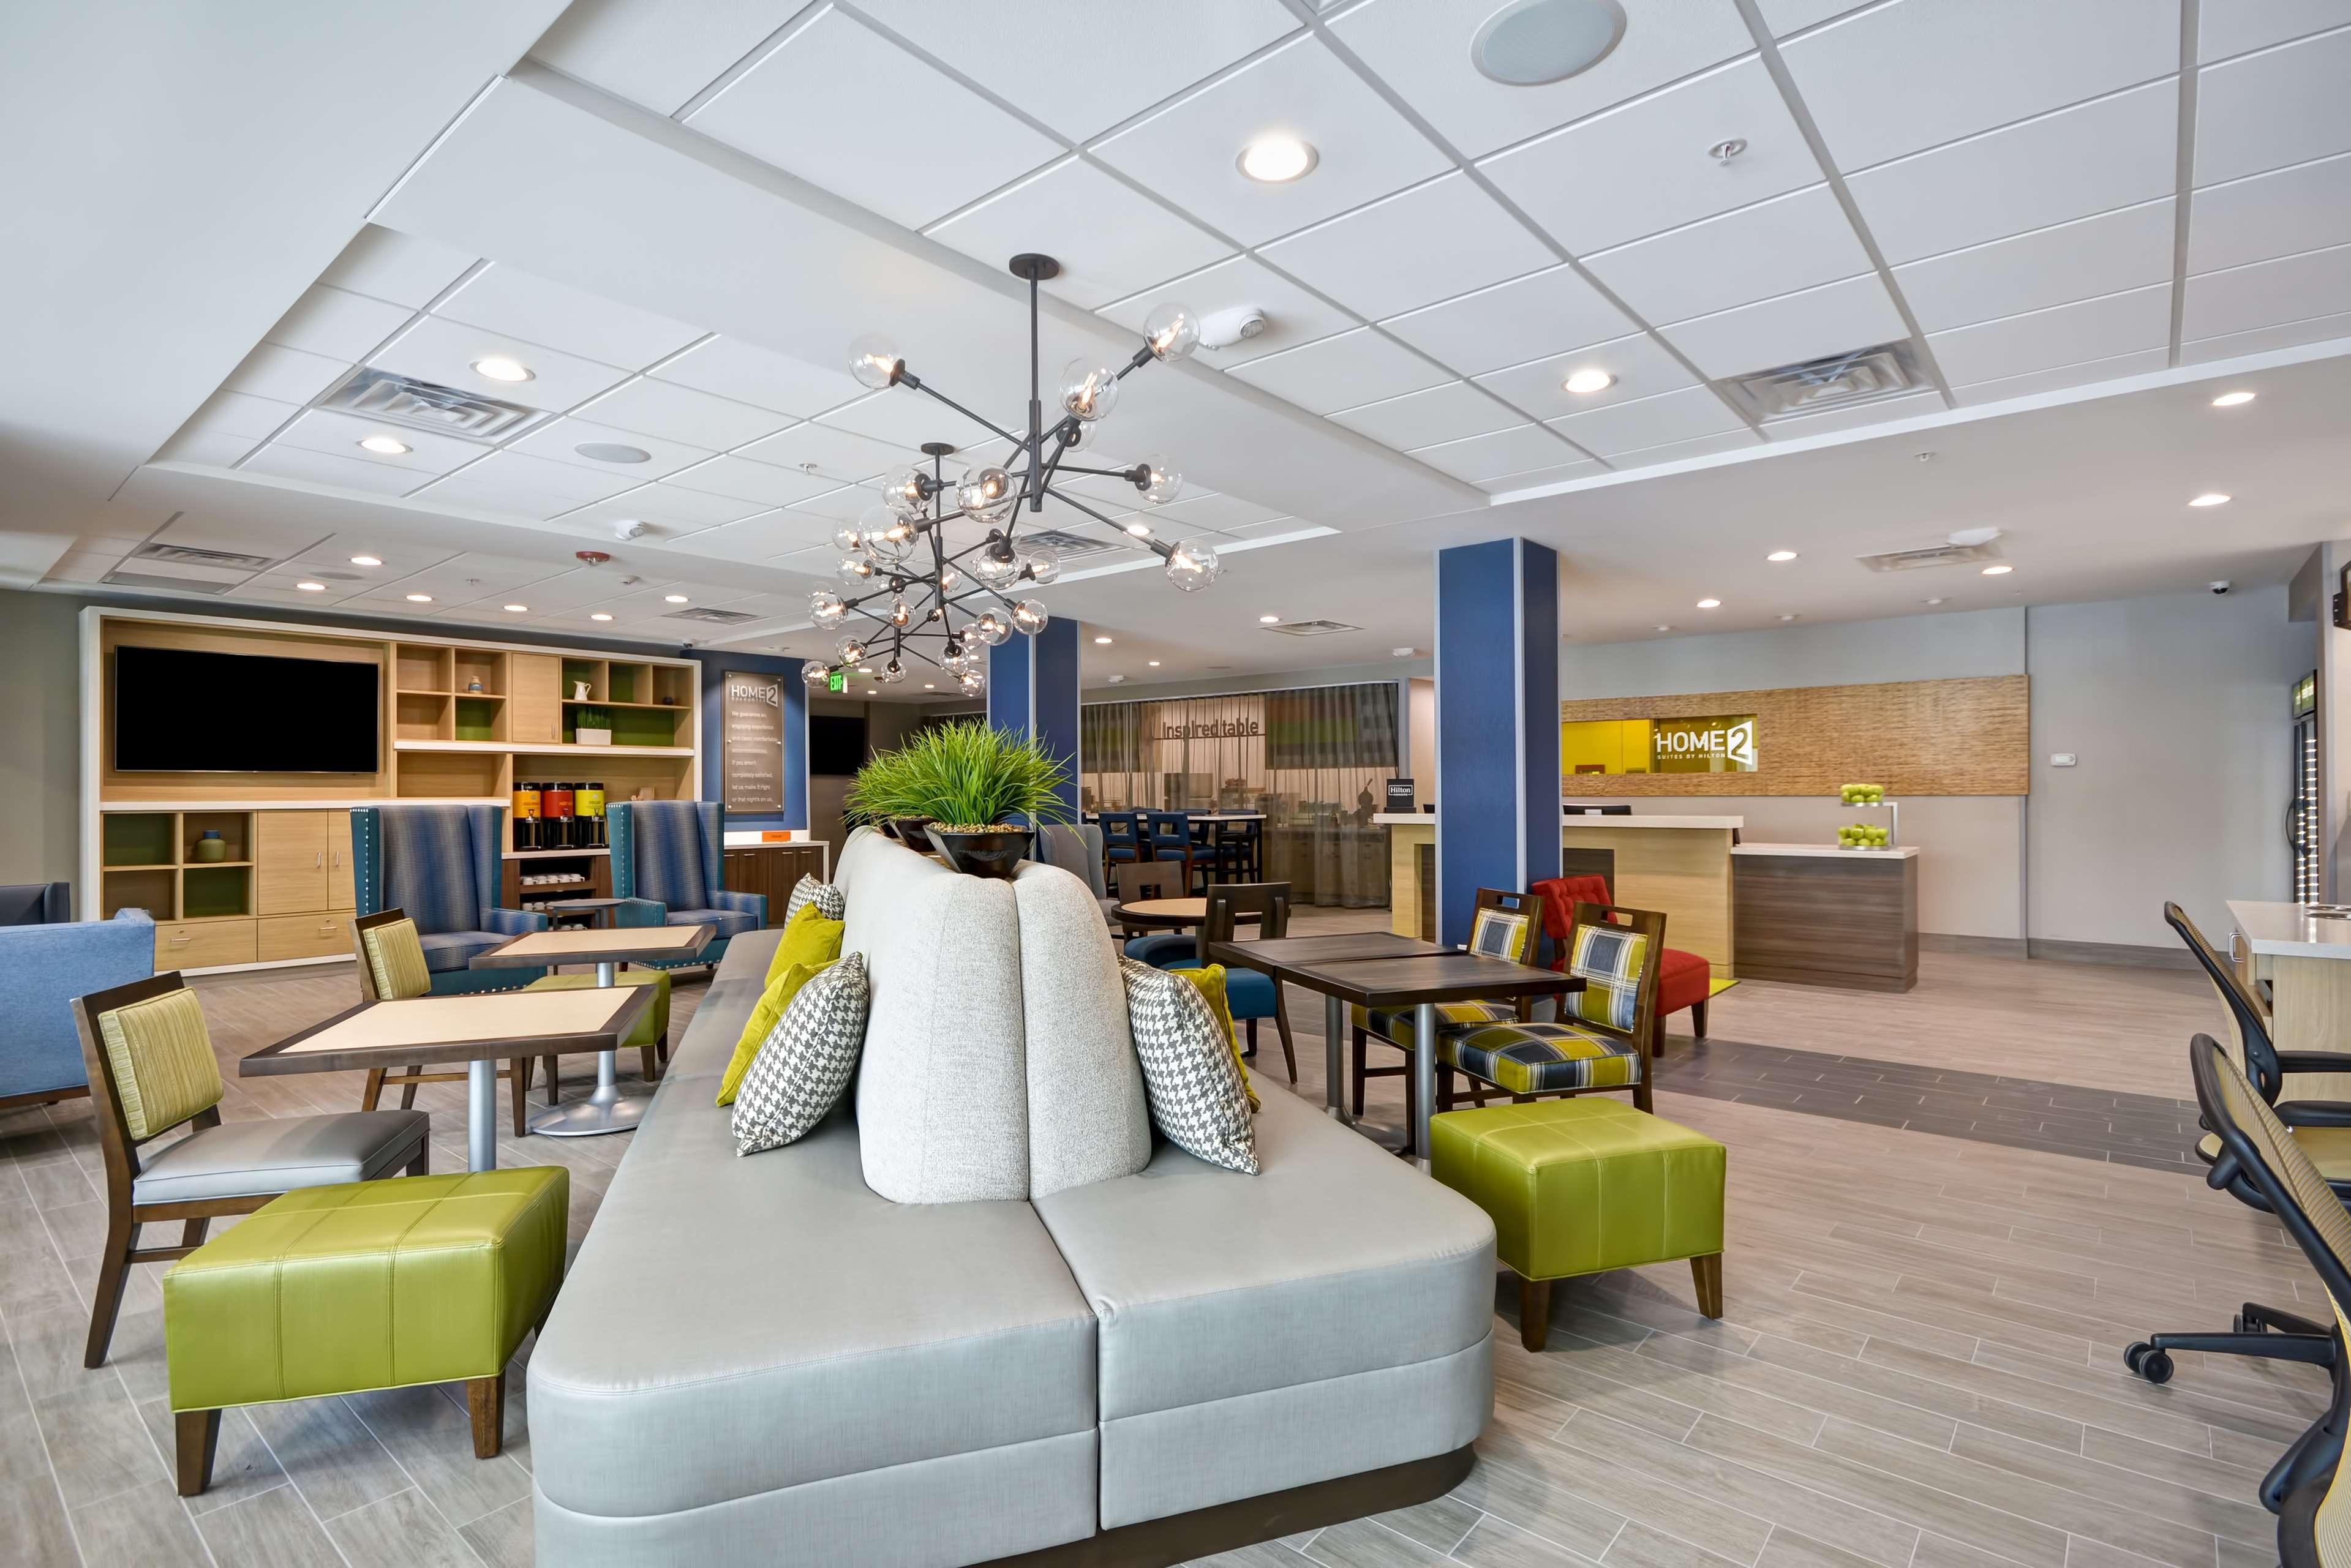 Home2 Suites by Hilton Jackson image 3